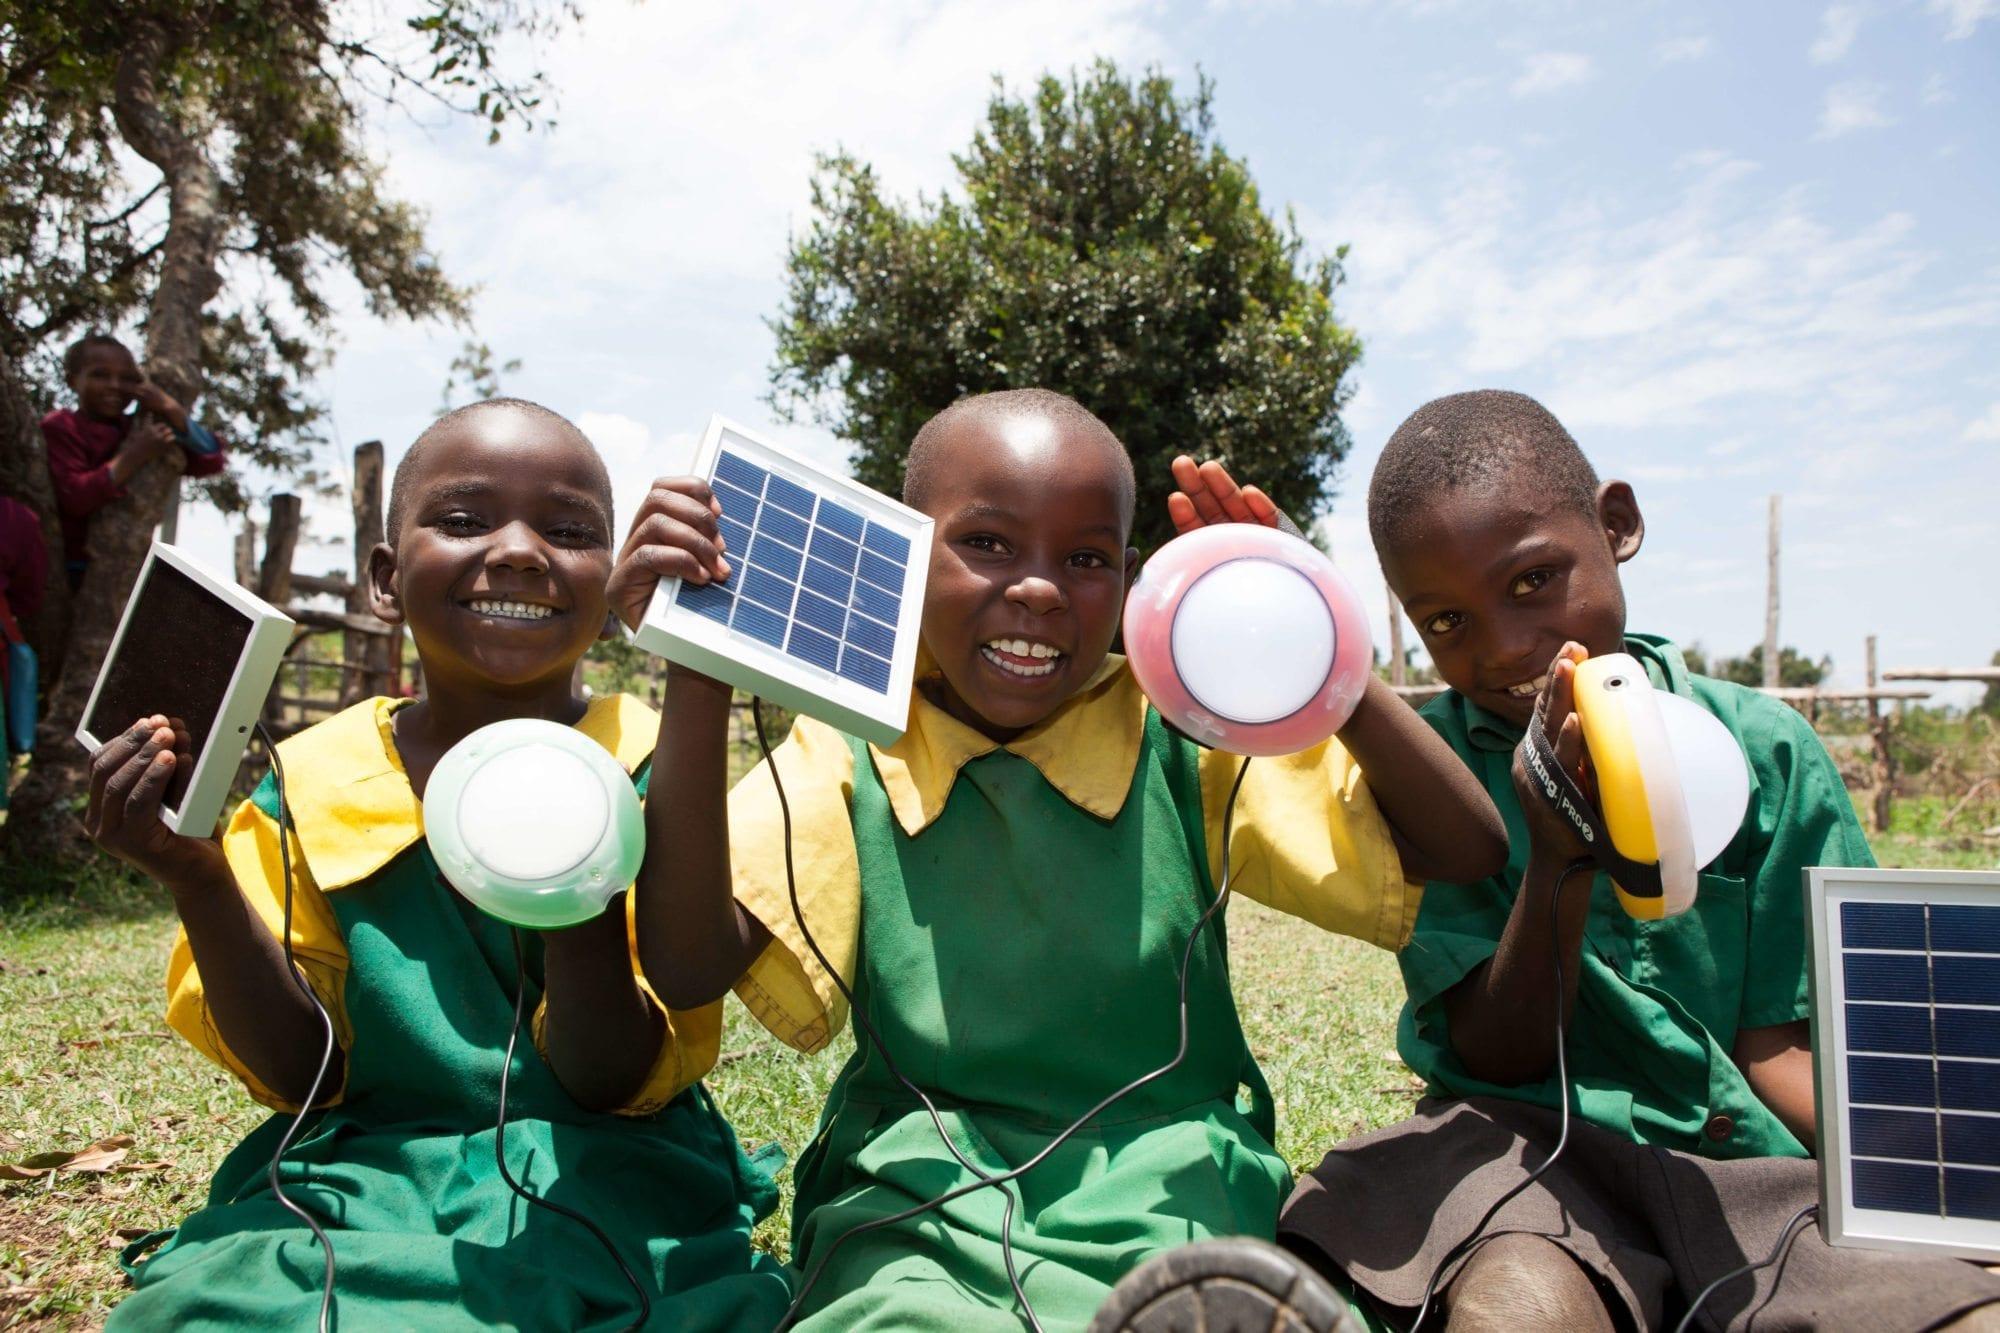 Alternative energy in East Africa: The case for solar power